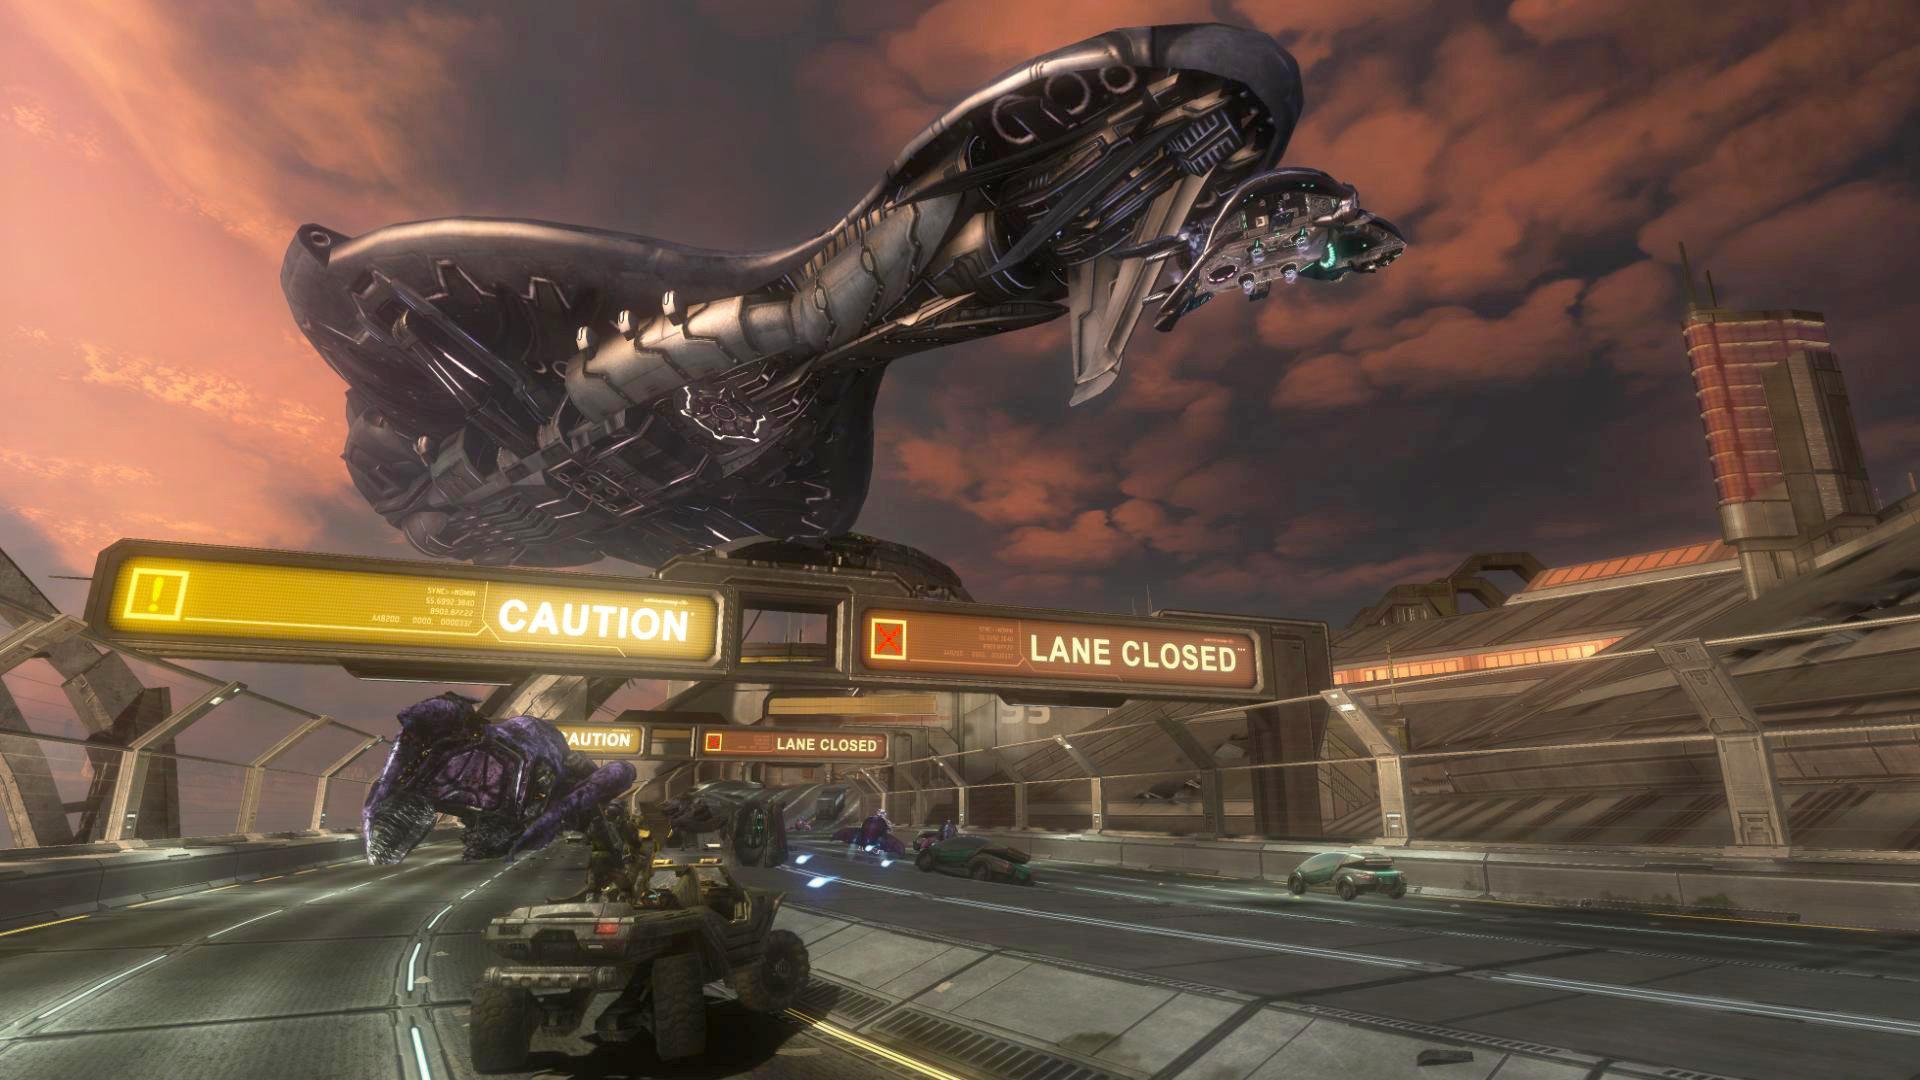 ArtStation - Halo 3 ODST: Covenant Fleet Ship 1 (3d hard surface model)  in-game, Milton Cadogan